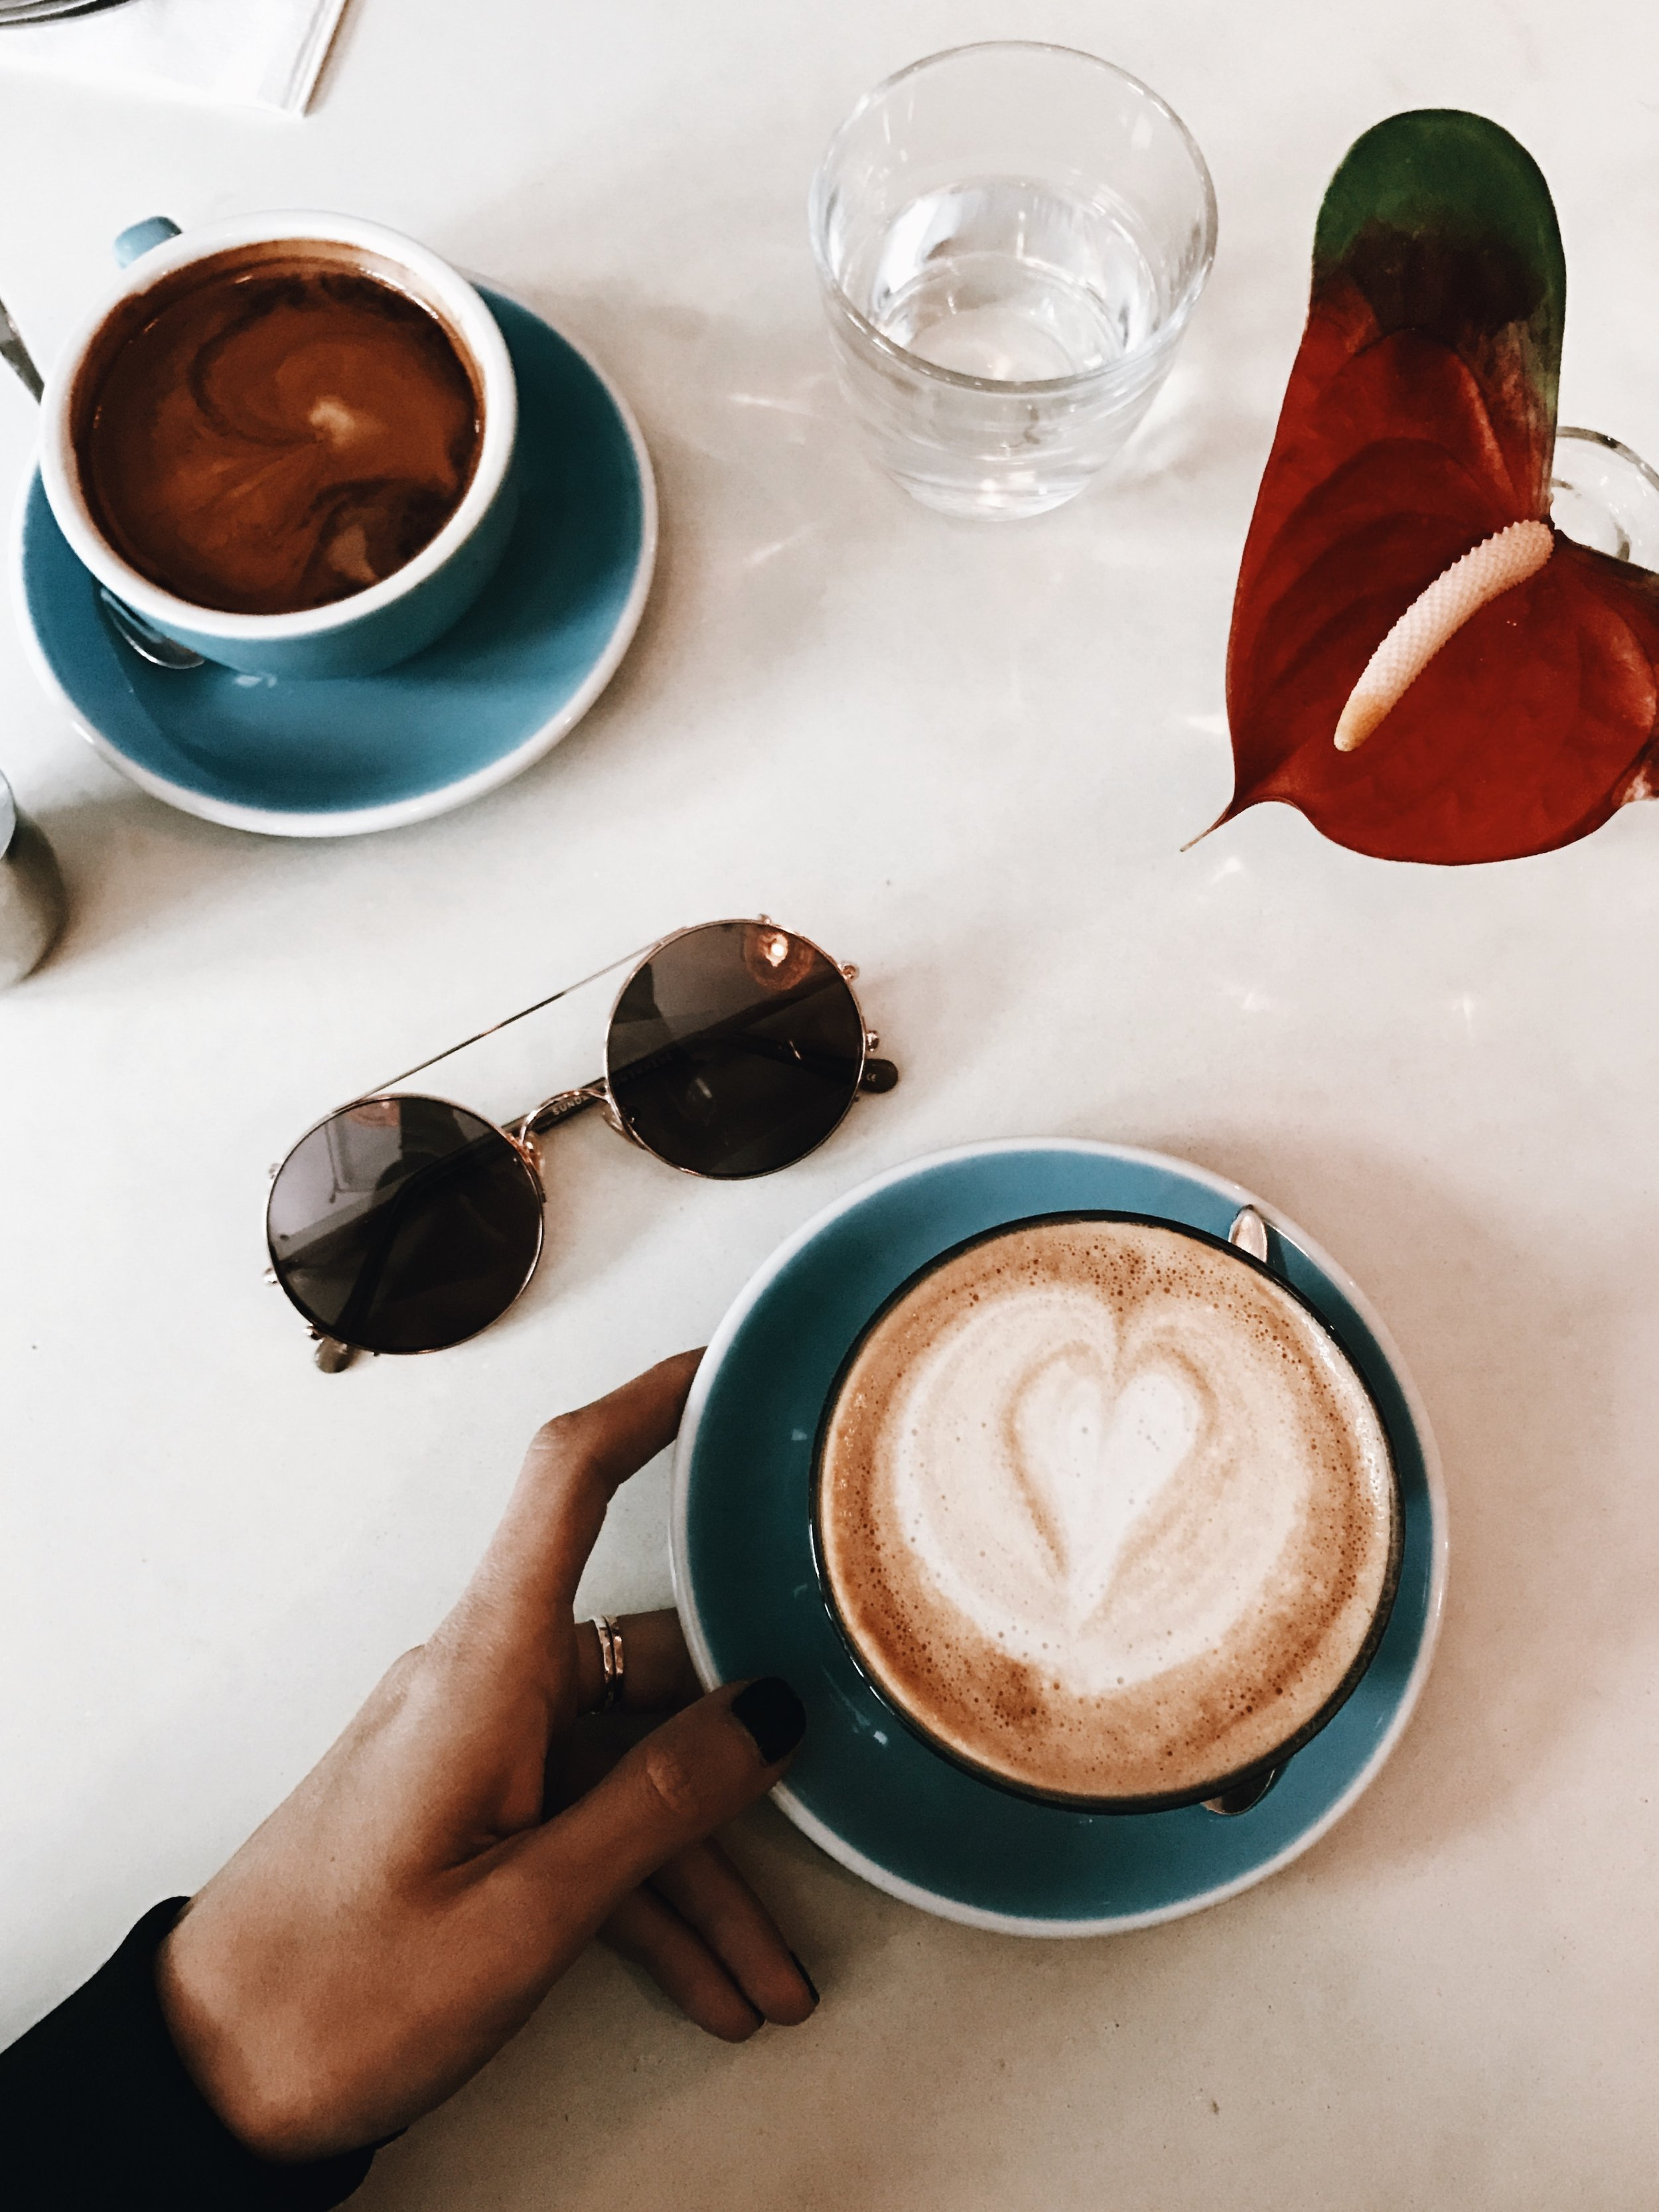 Always needing some warm coffee around the corner :)